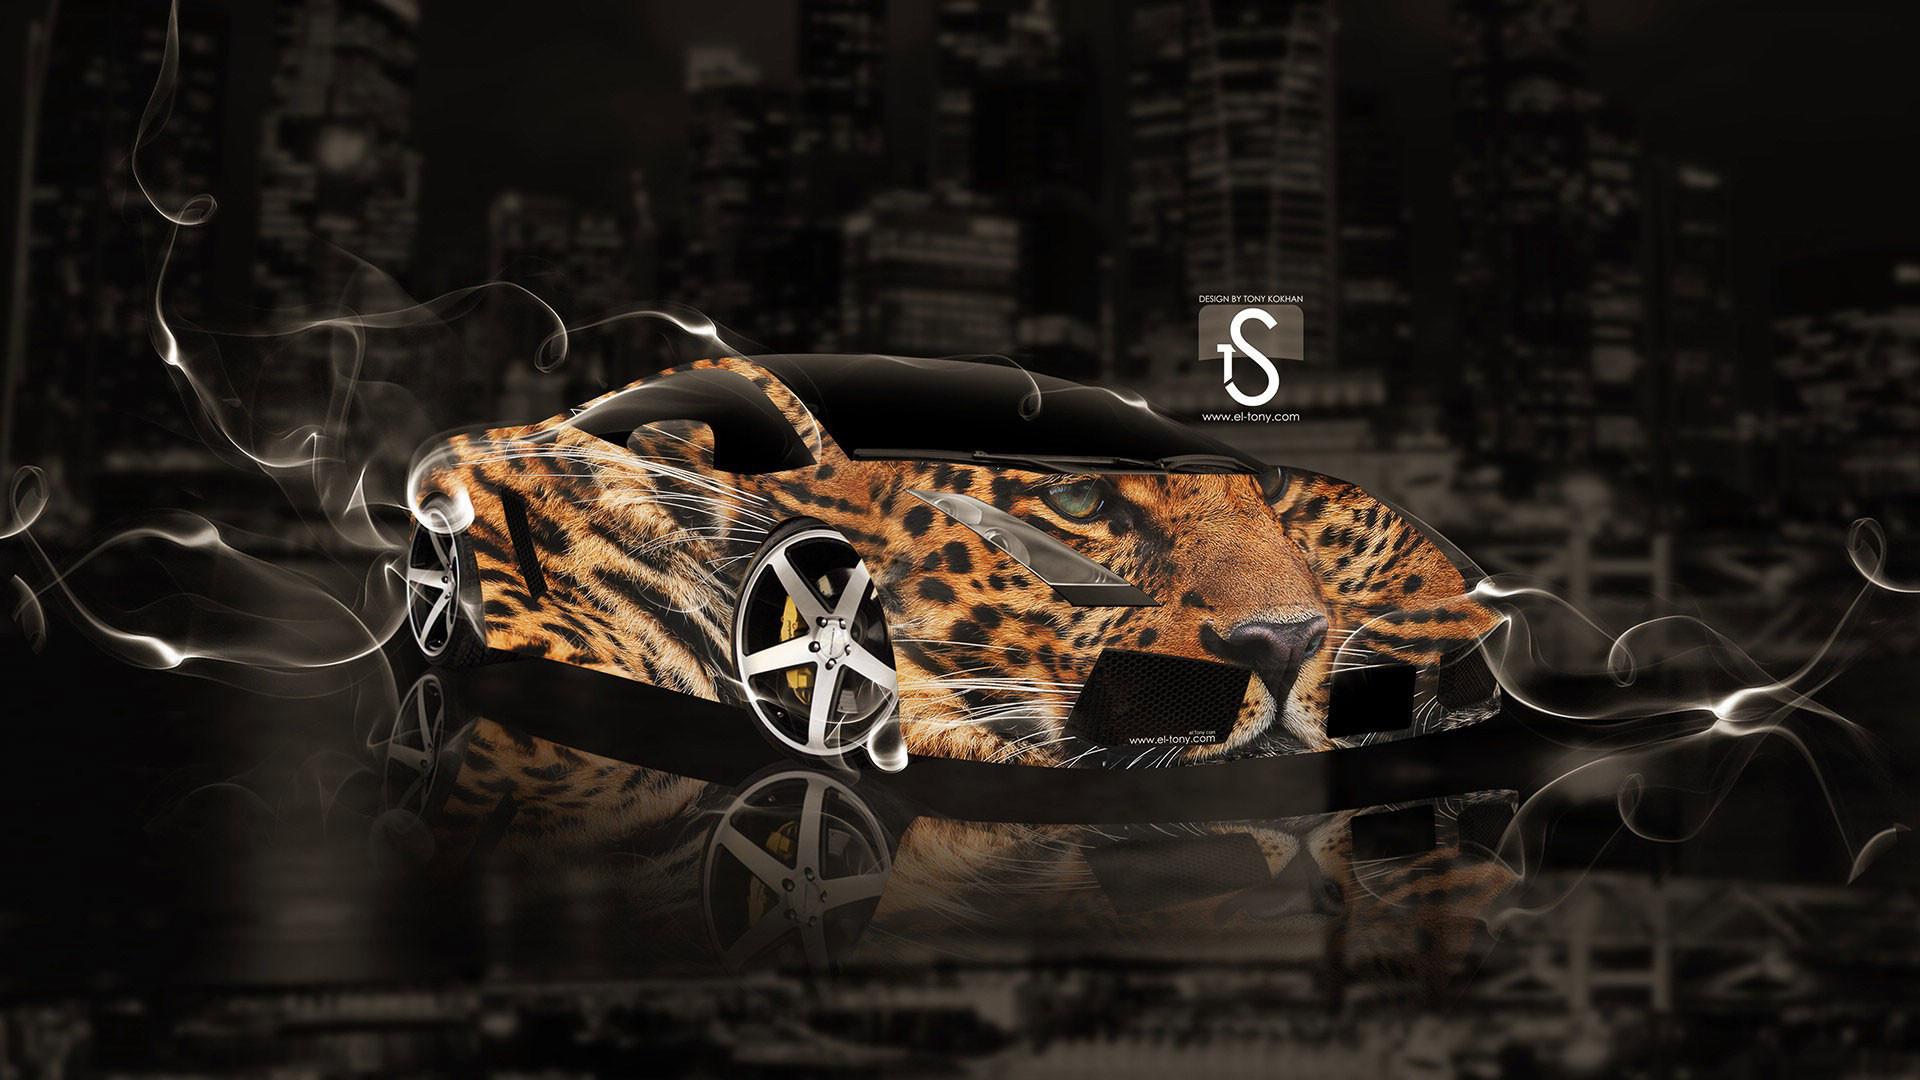 hd pics photos best car animated smoke animal cheetah hd quality desktop  background wallpaper